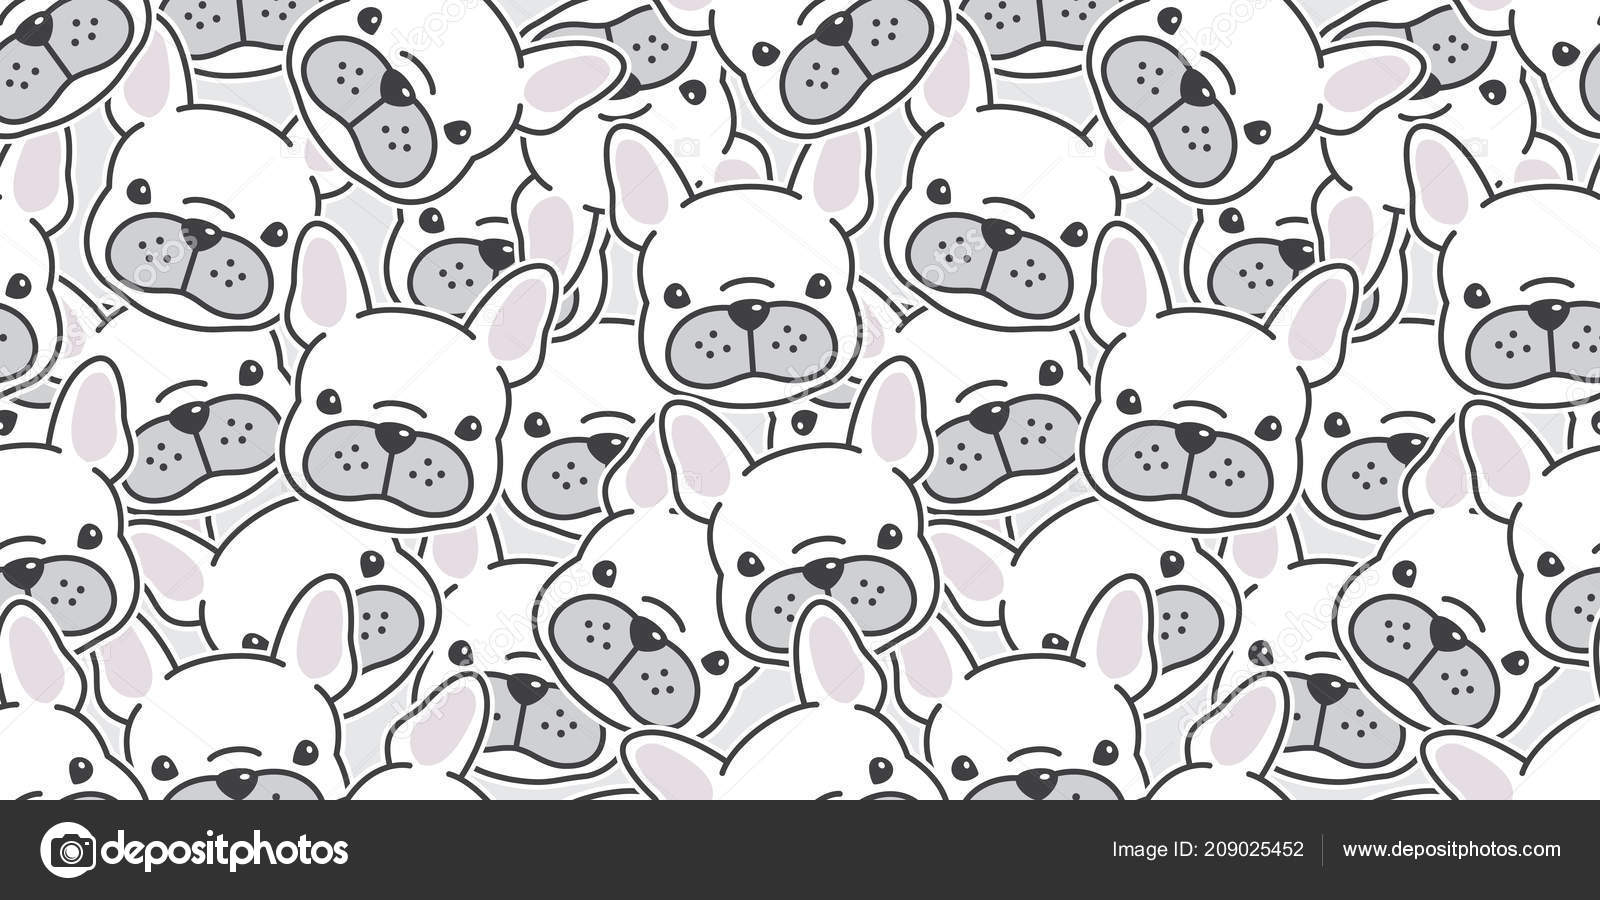 French Bulldog Cartoon Wallpaper Dog Seamless Pattern French Bulldog Vector Scarf Isolated Wallpaper Background Stock Vector C Cnuisin 209025452